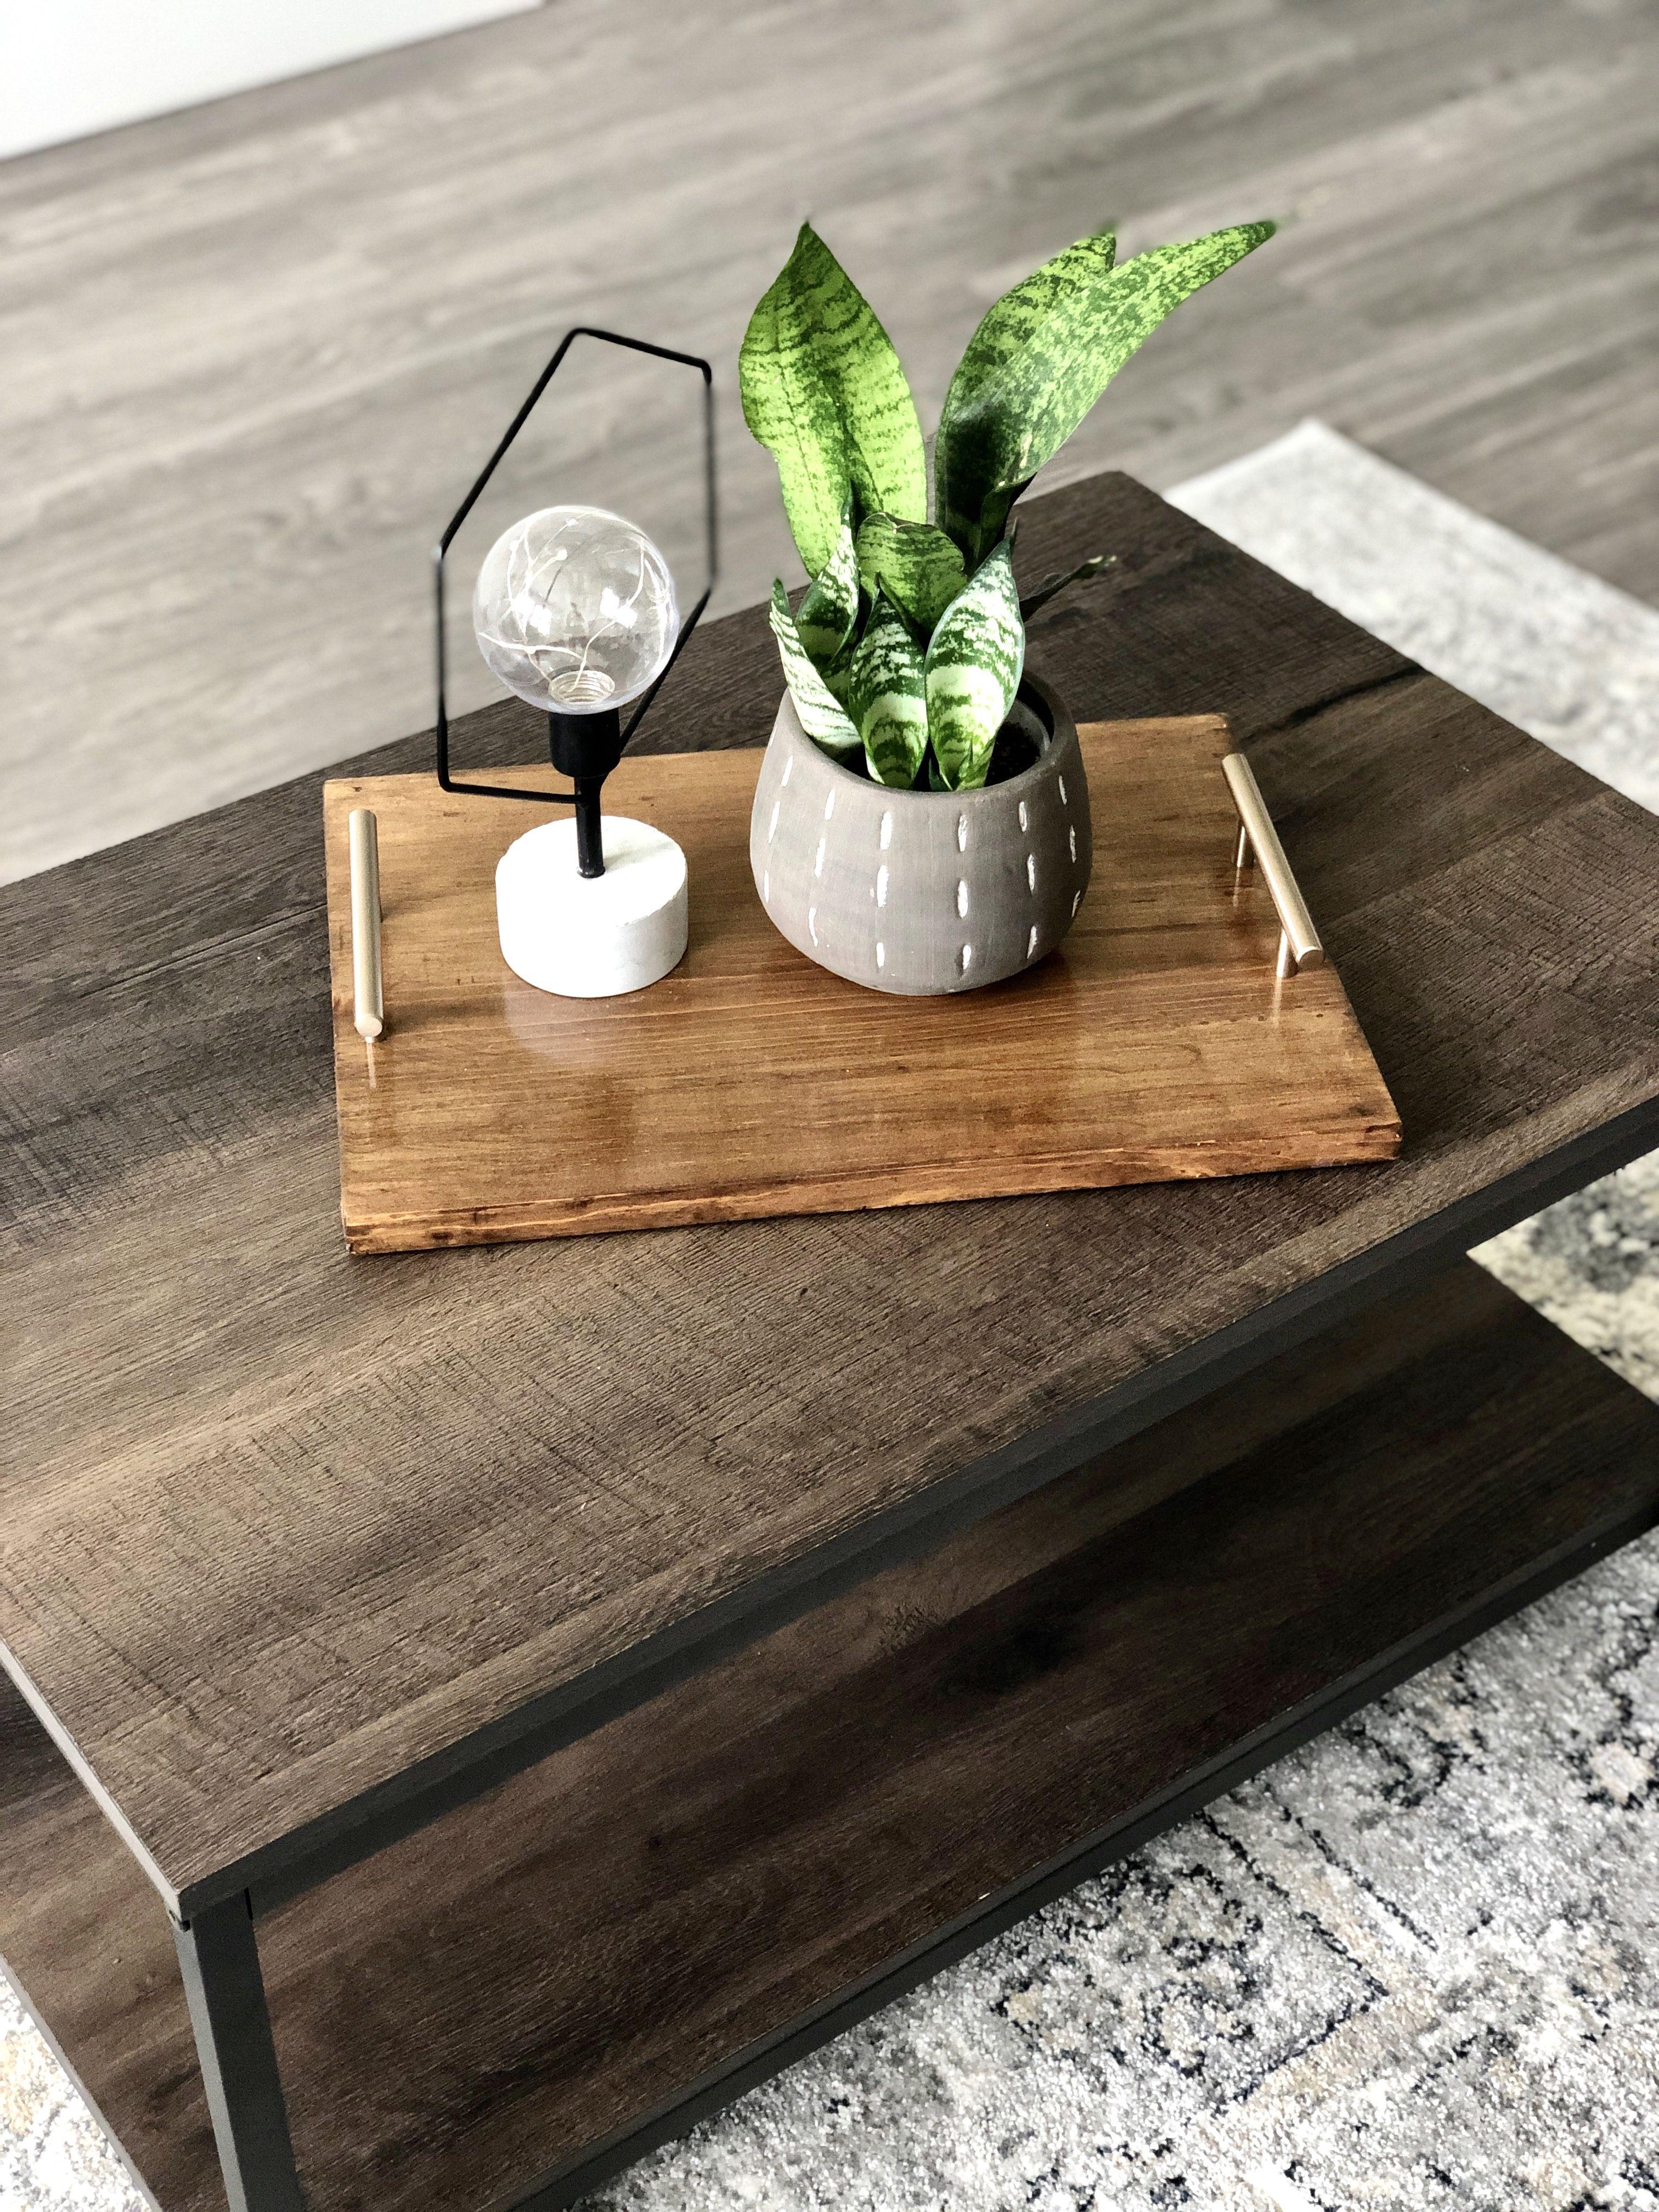 Handmade Modern Wooden Serving Tray Custom Serving Tray Wooden Serving Trays Coffee Table Tray [ 4032 x 3024 Pixel ]